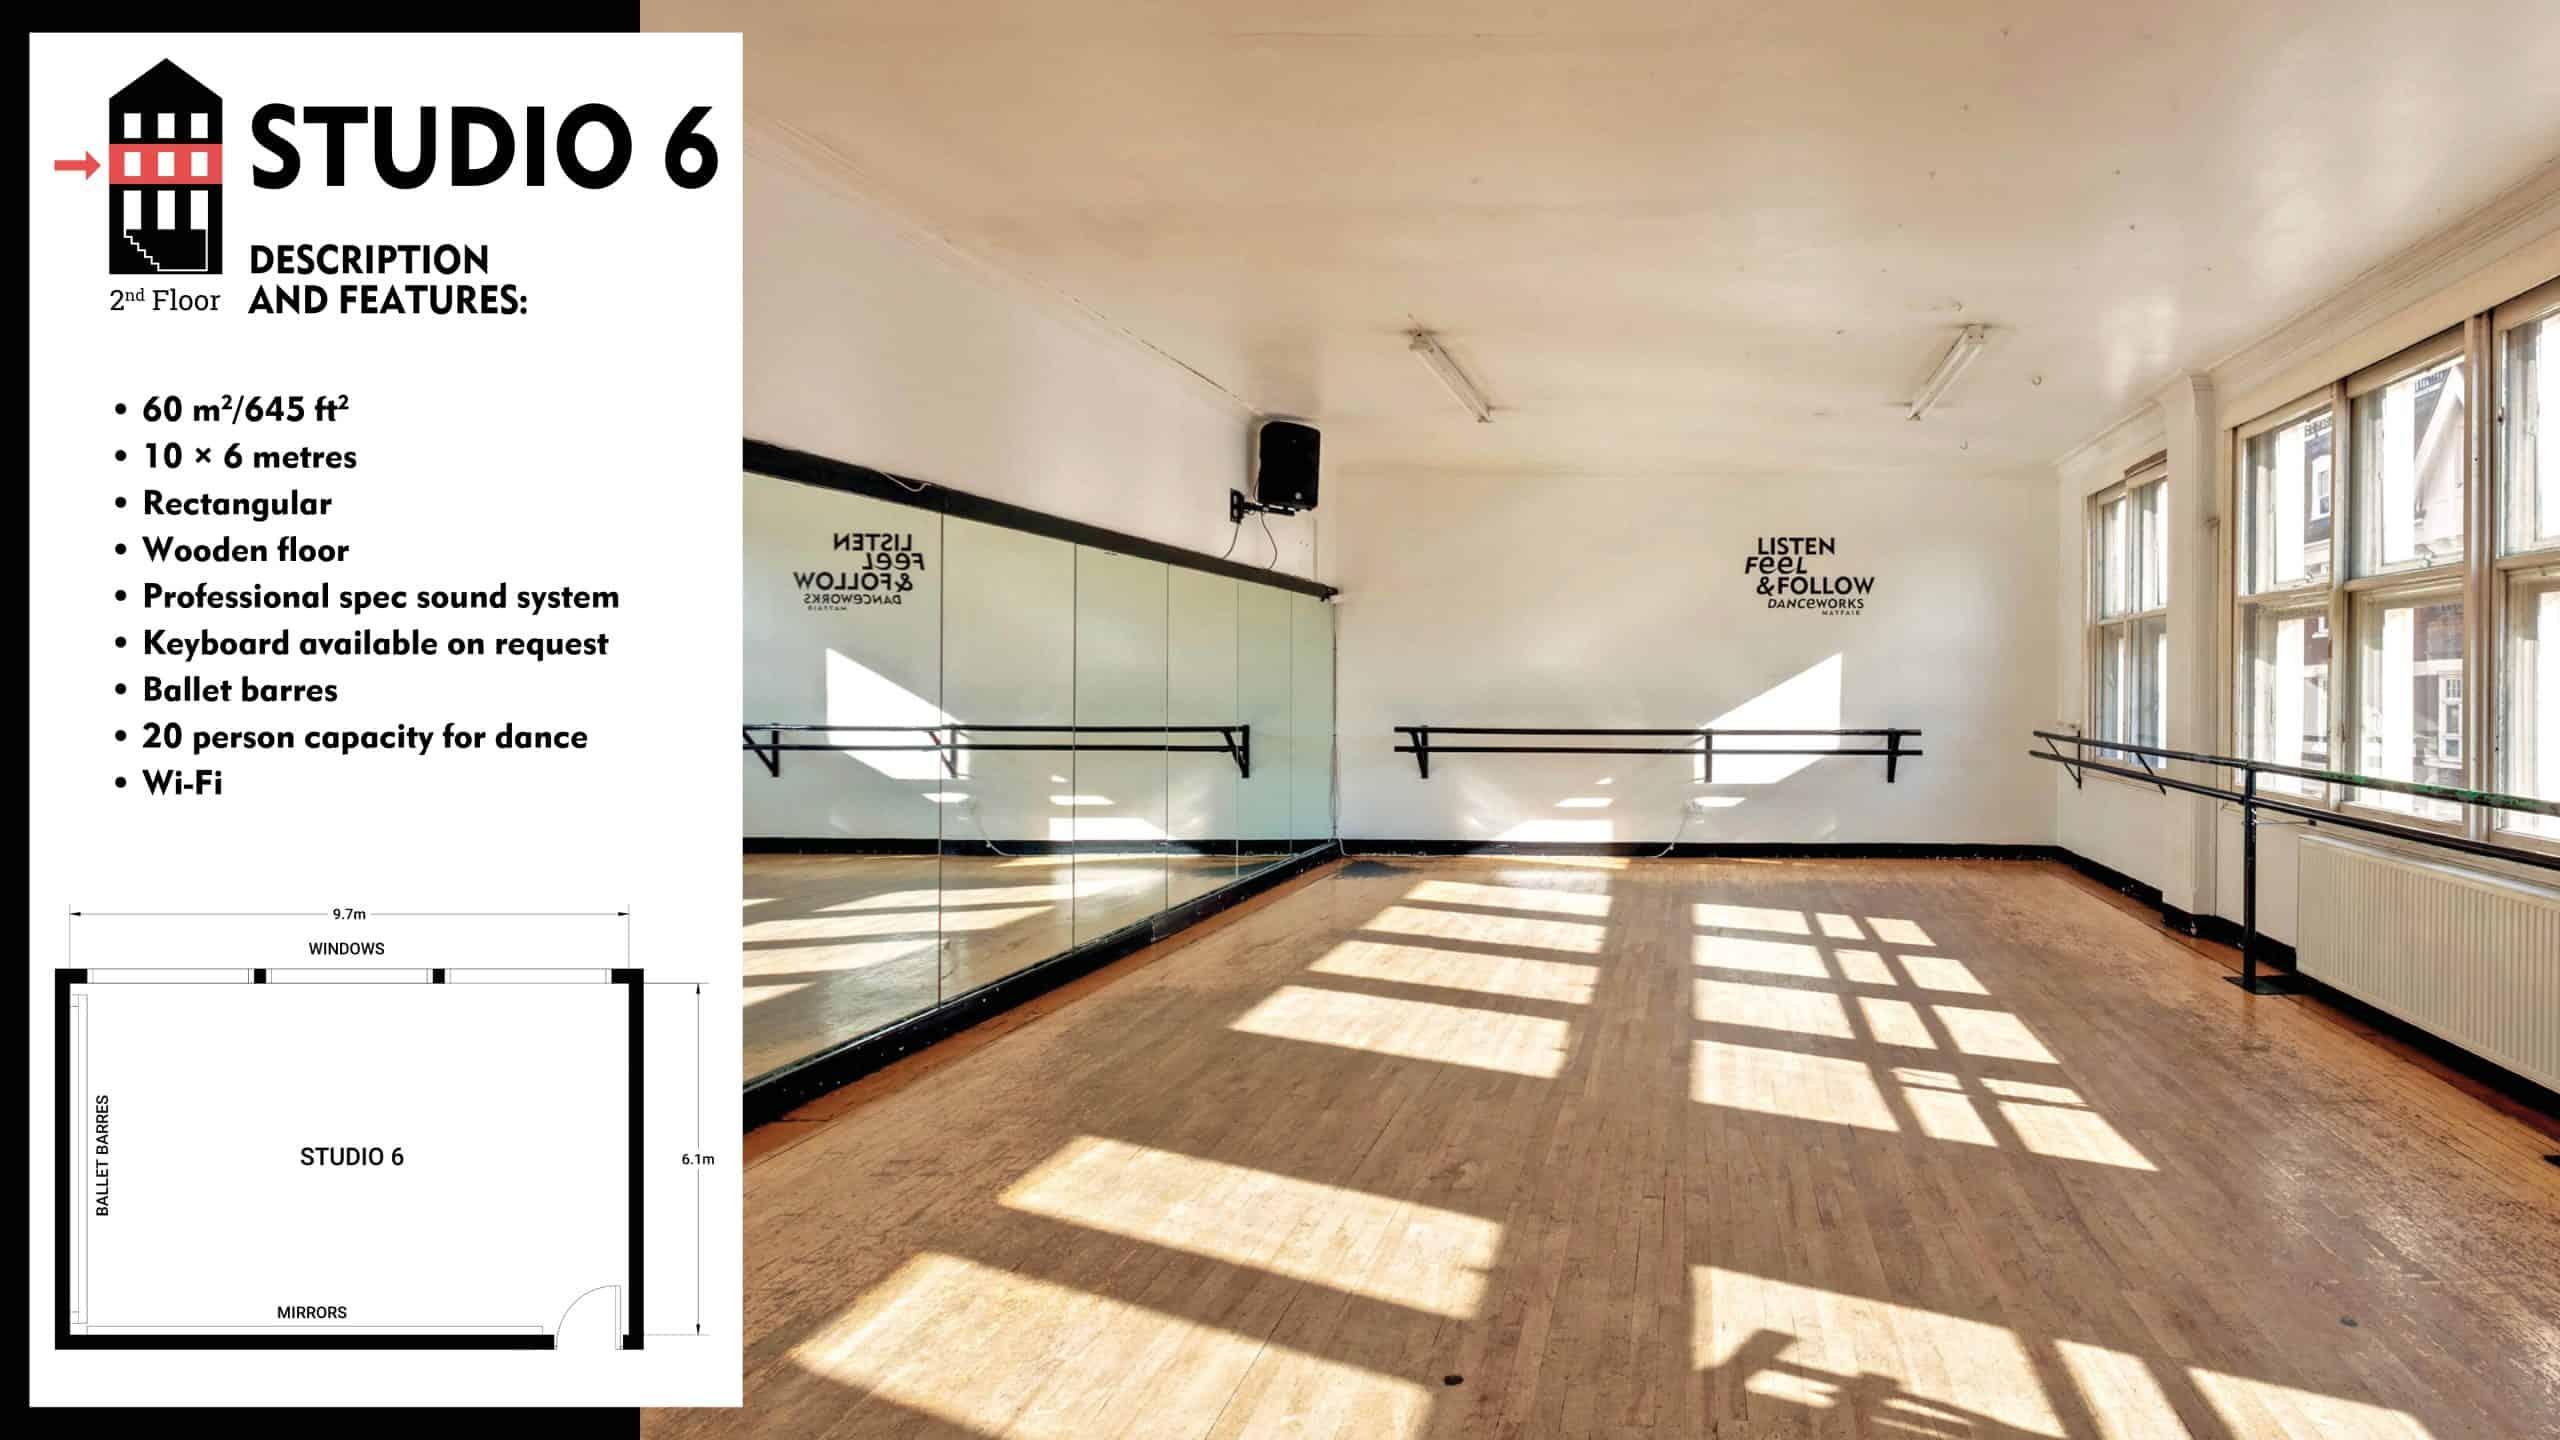 #Danceworks Studios 6 to Hire in London